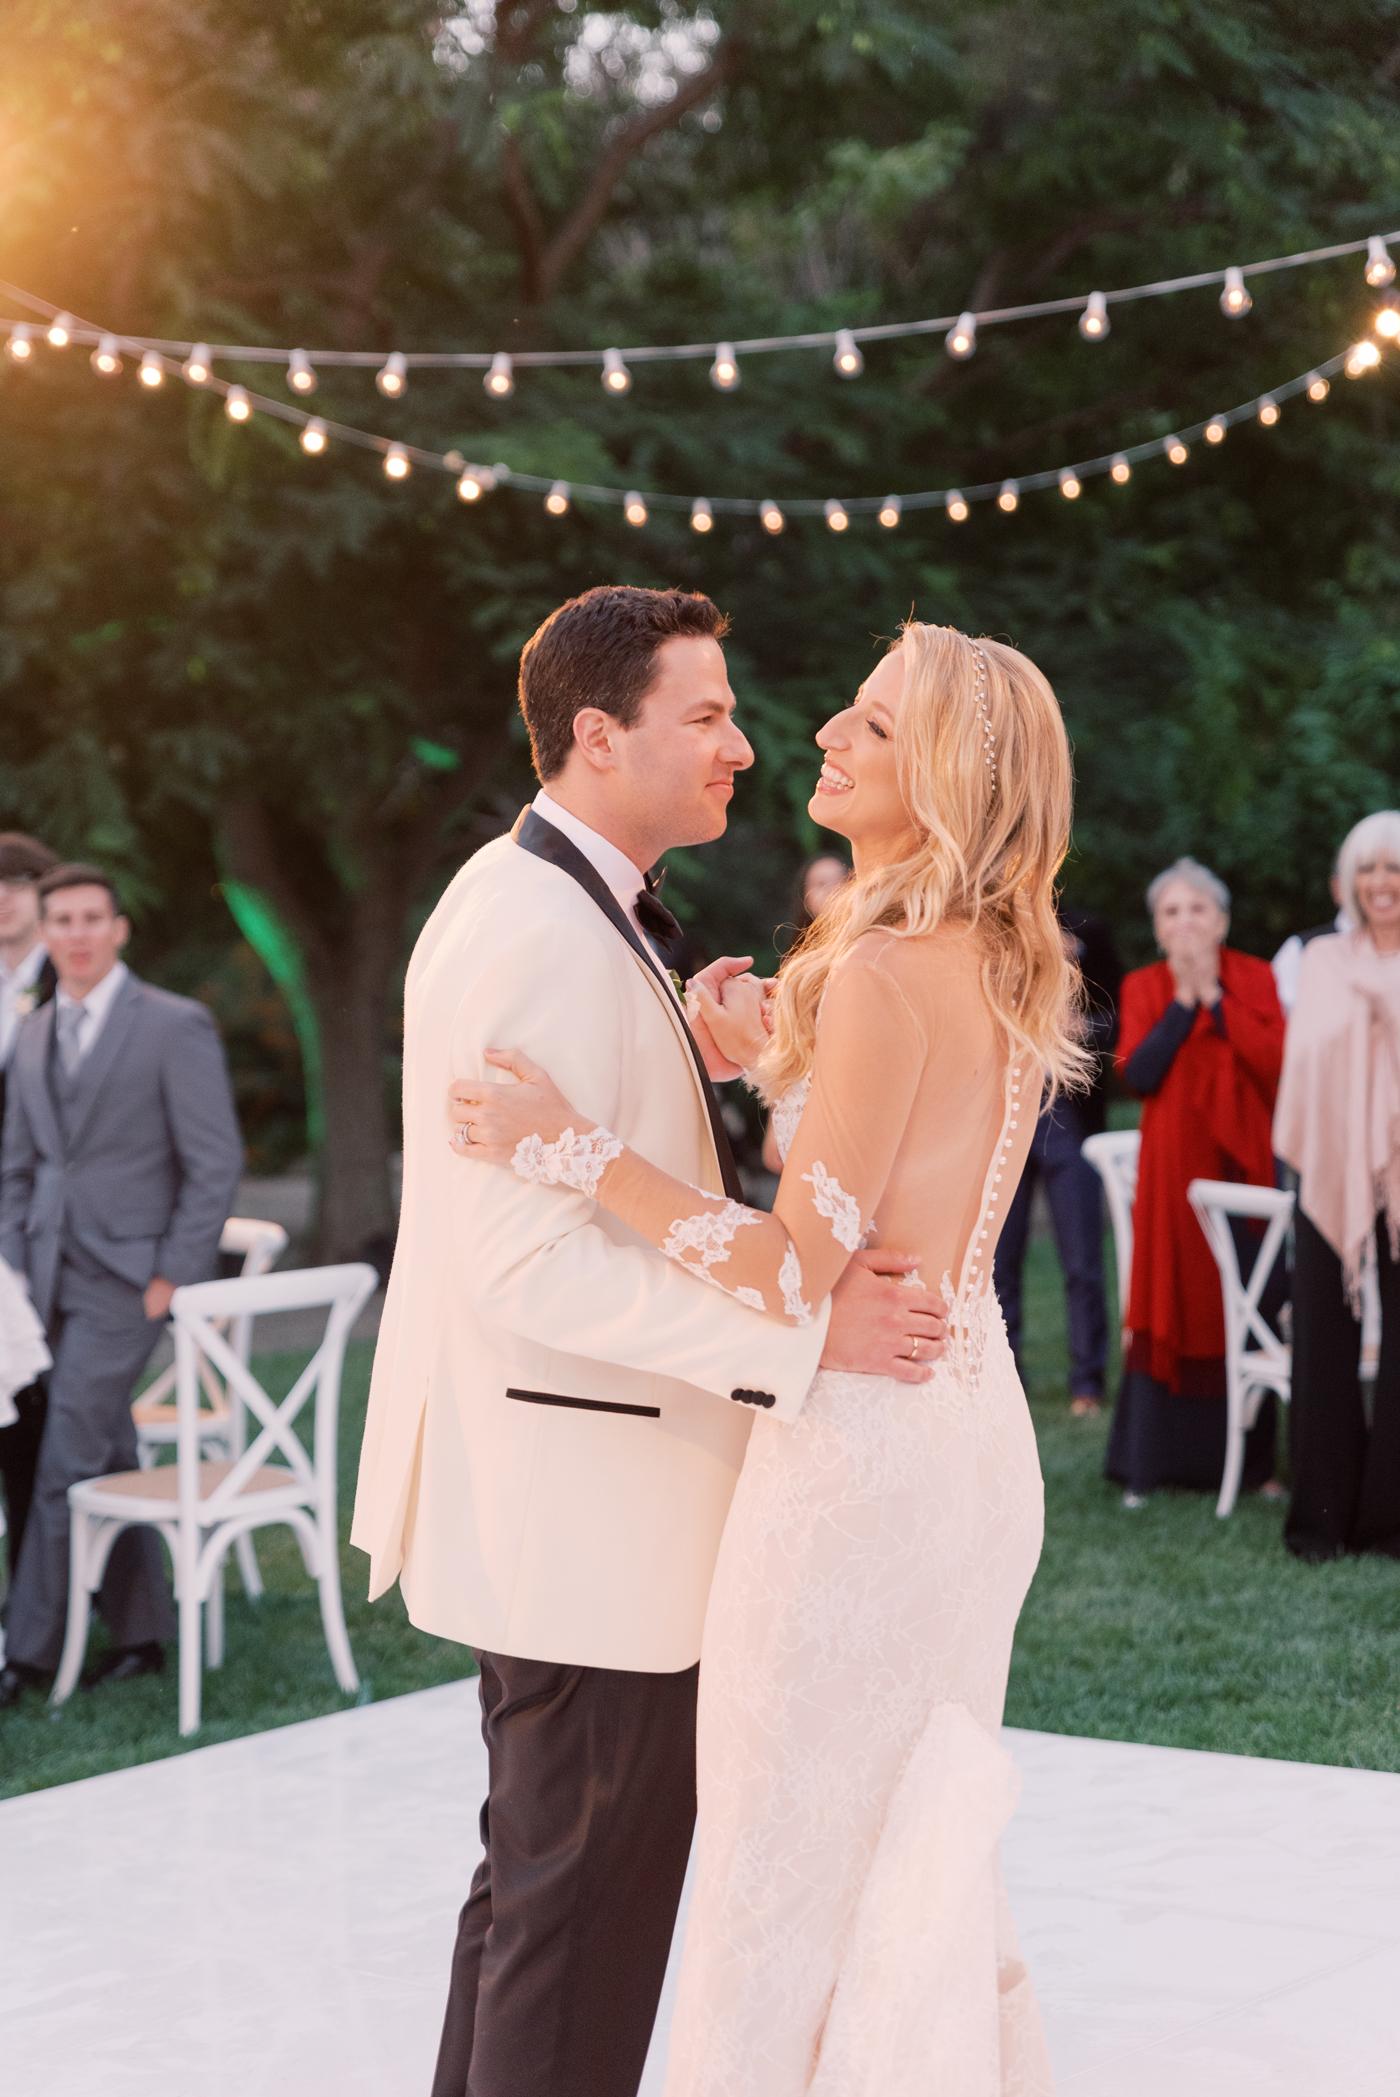 bride and groom first dance outside dance floor string lights